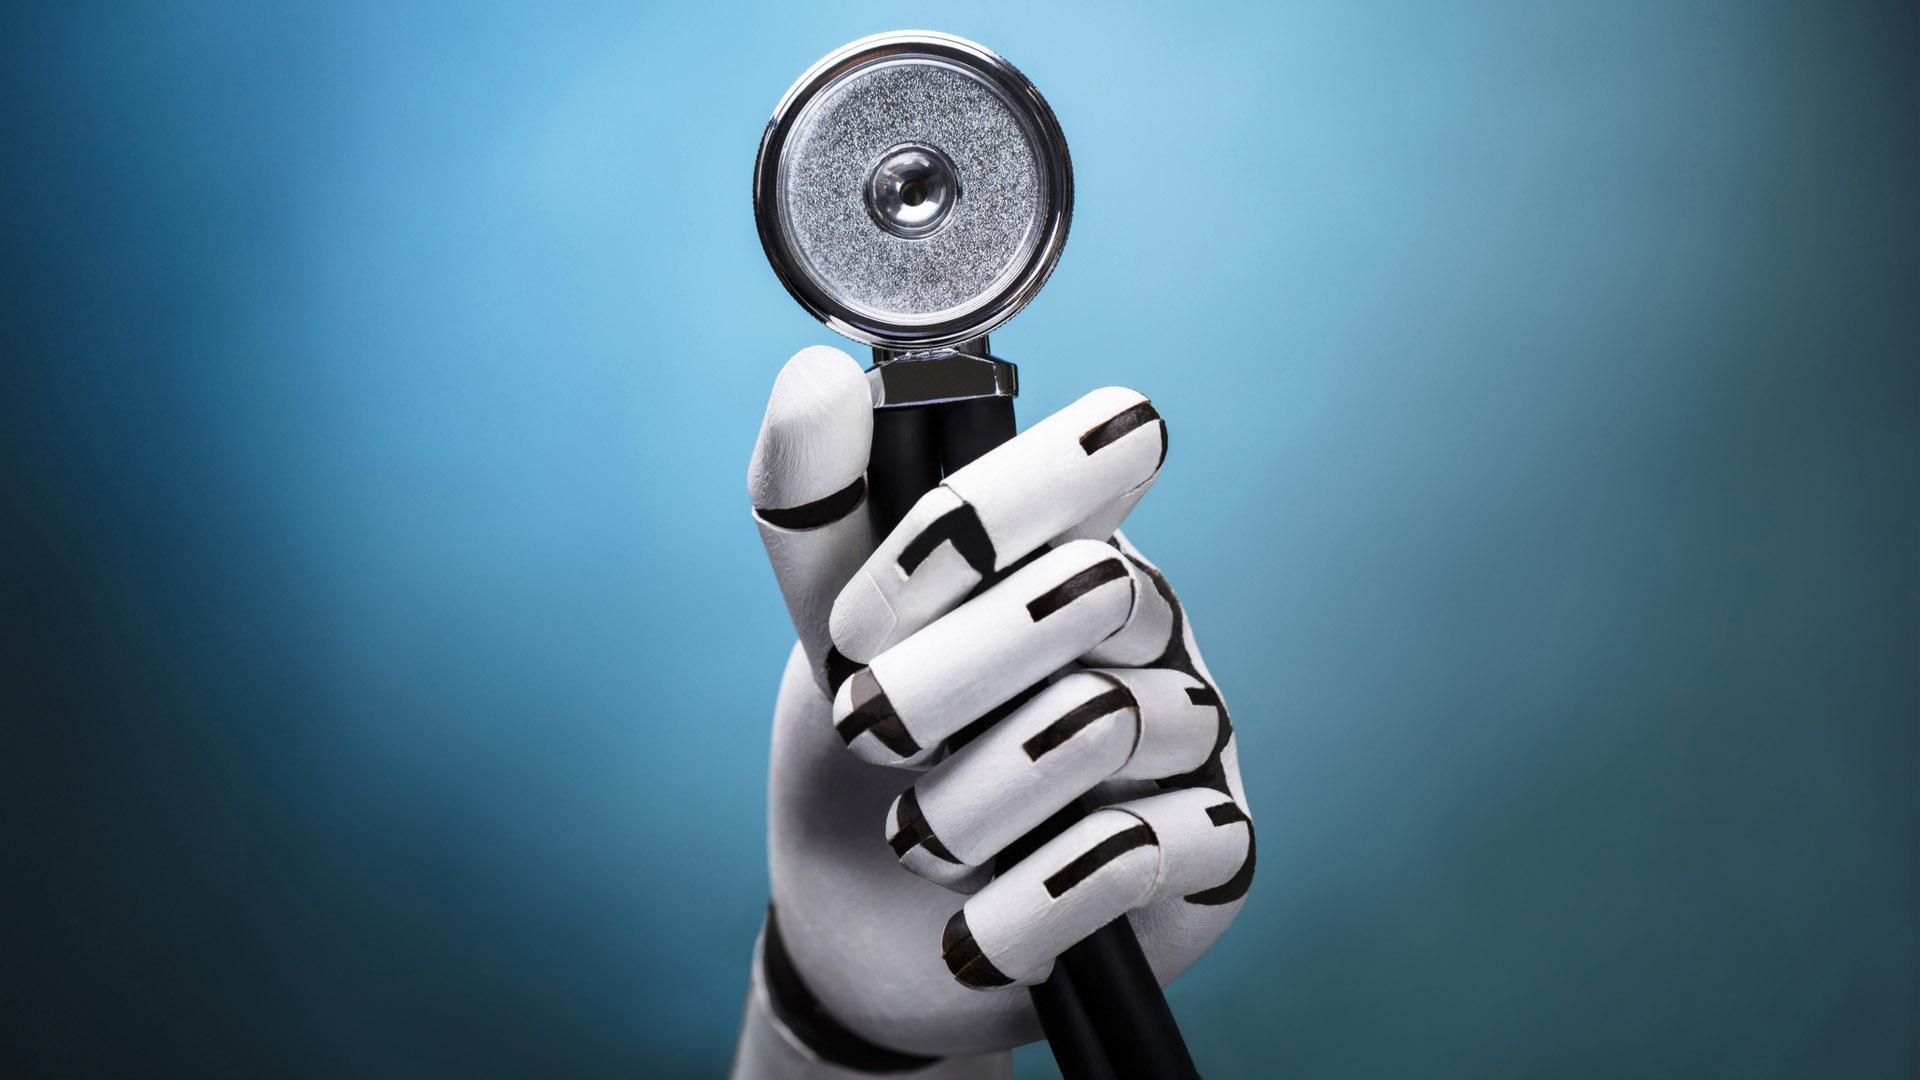 robot hand holding stethoscope